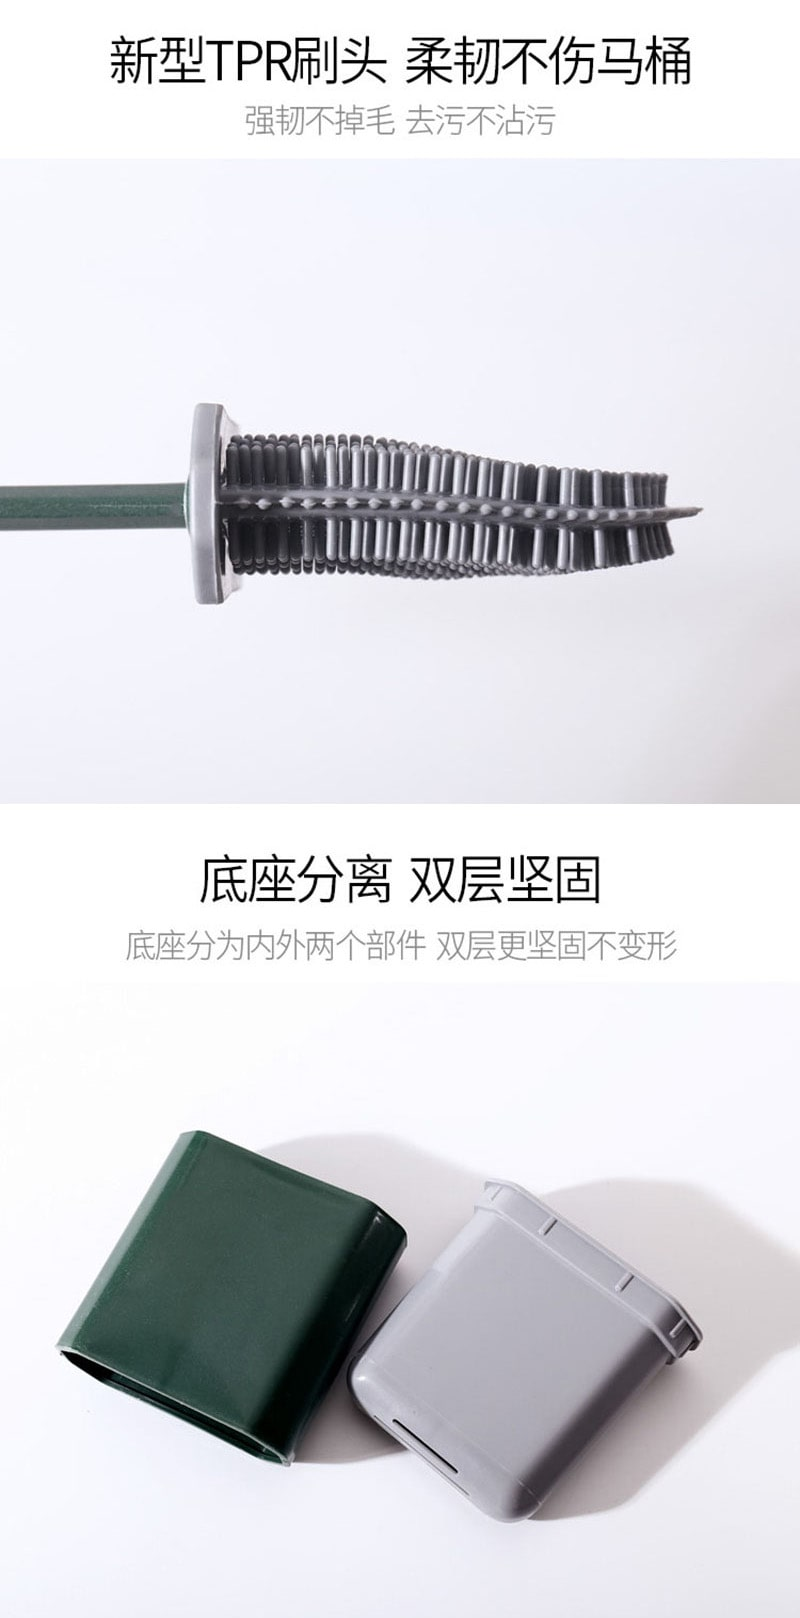 Toilet Bowl Brush - Features